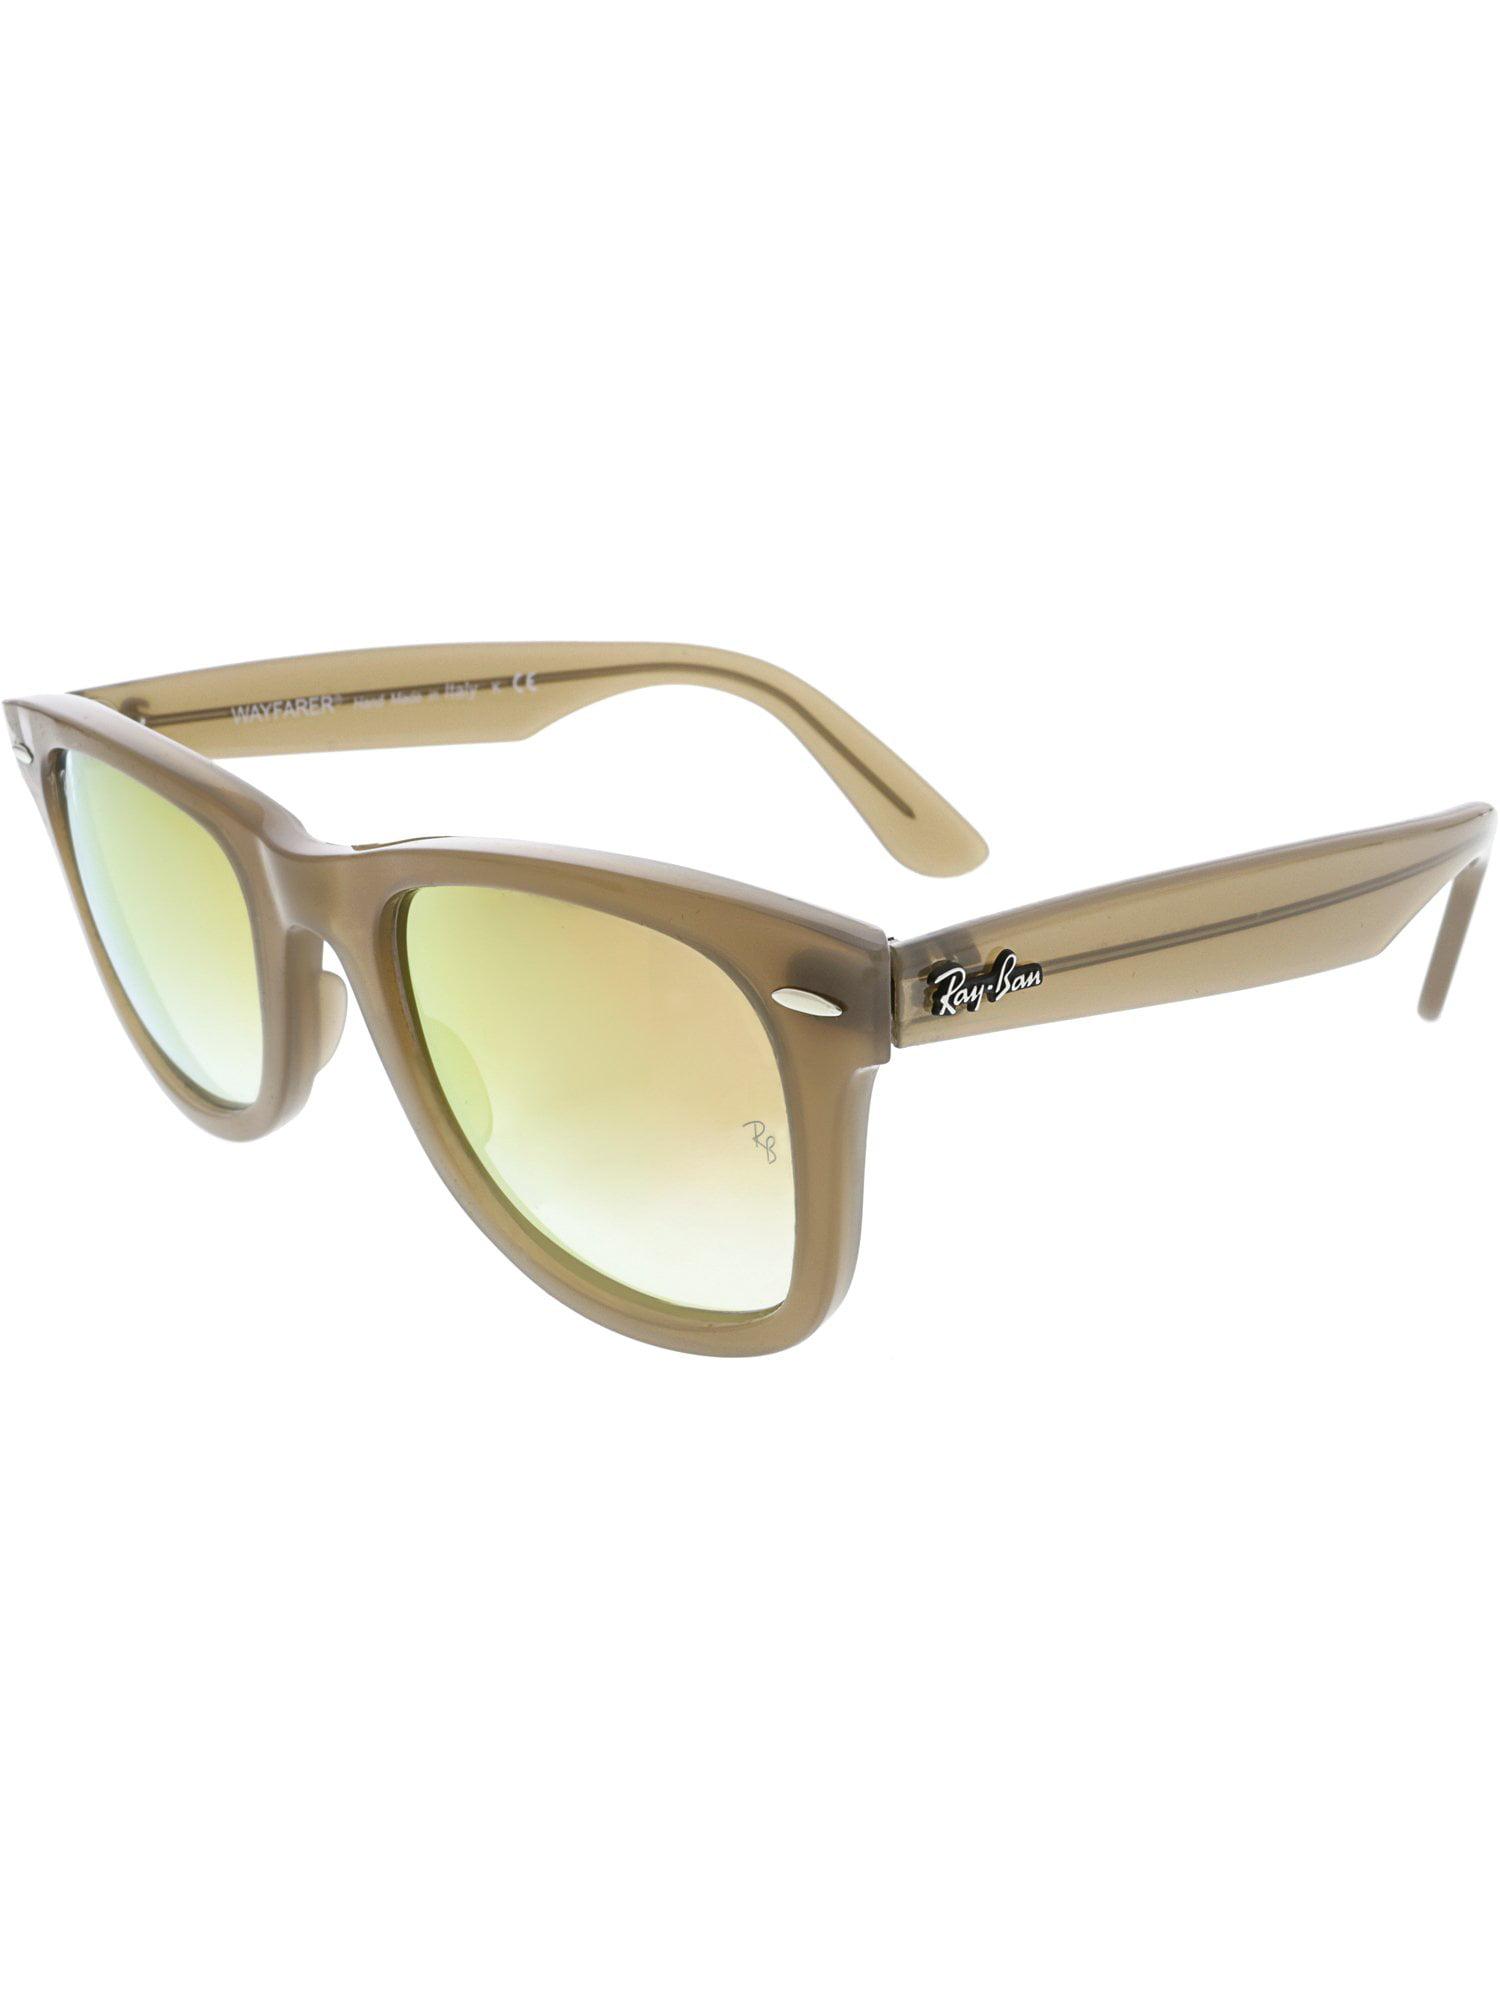 f4470da753 ... store ray ban womens gradient wayfarer ease rb4340 61667y 50 brown  sunglasses ac7ad 12b92